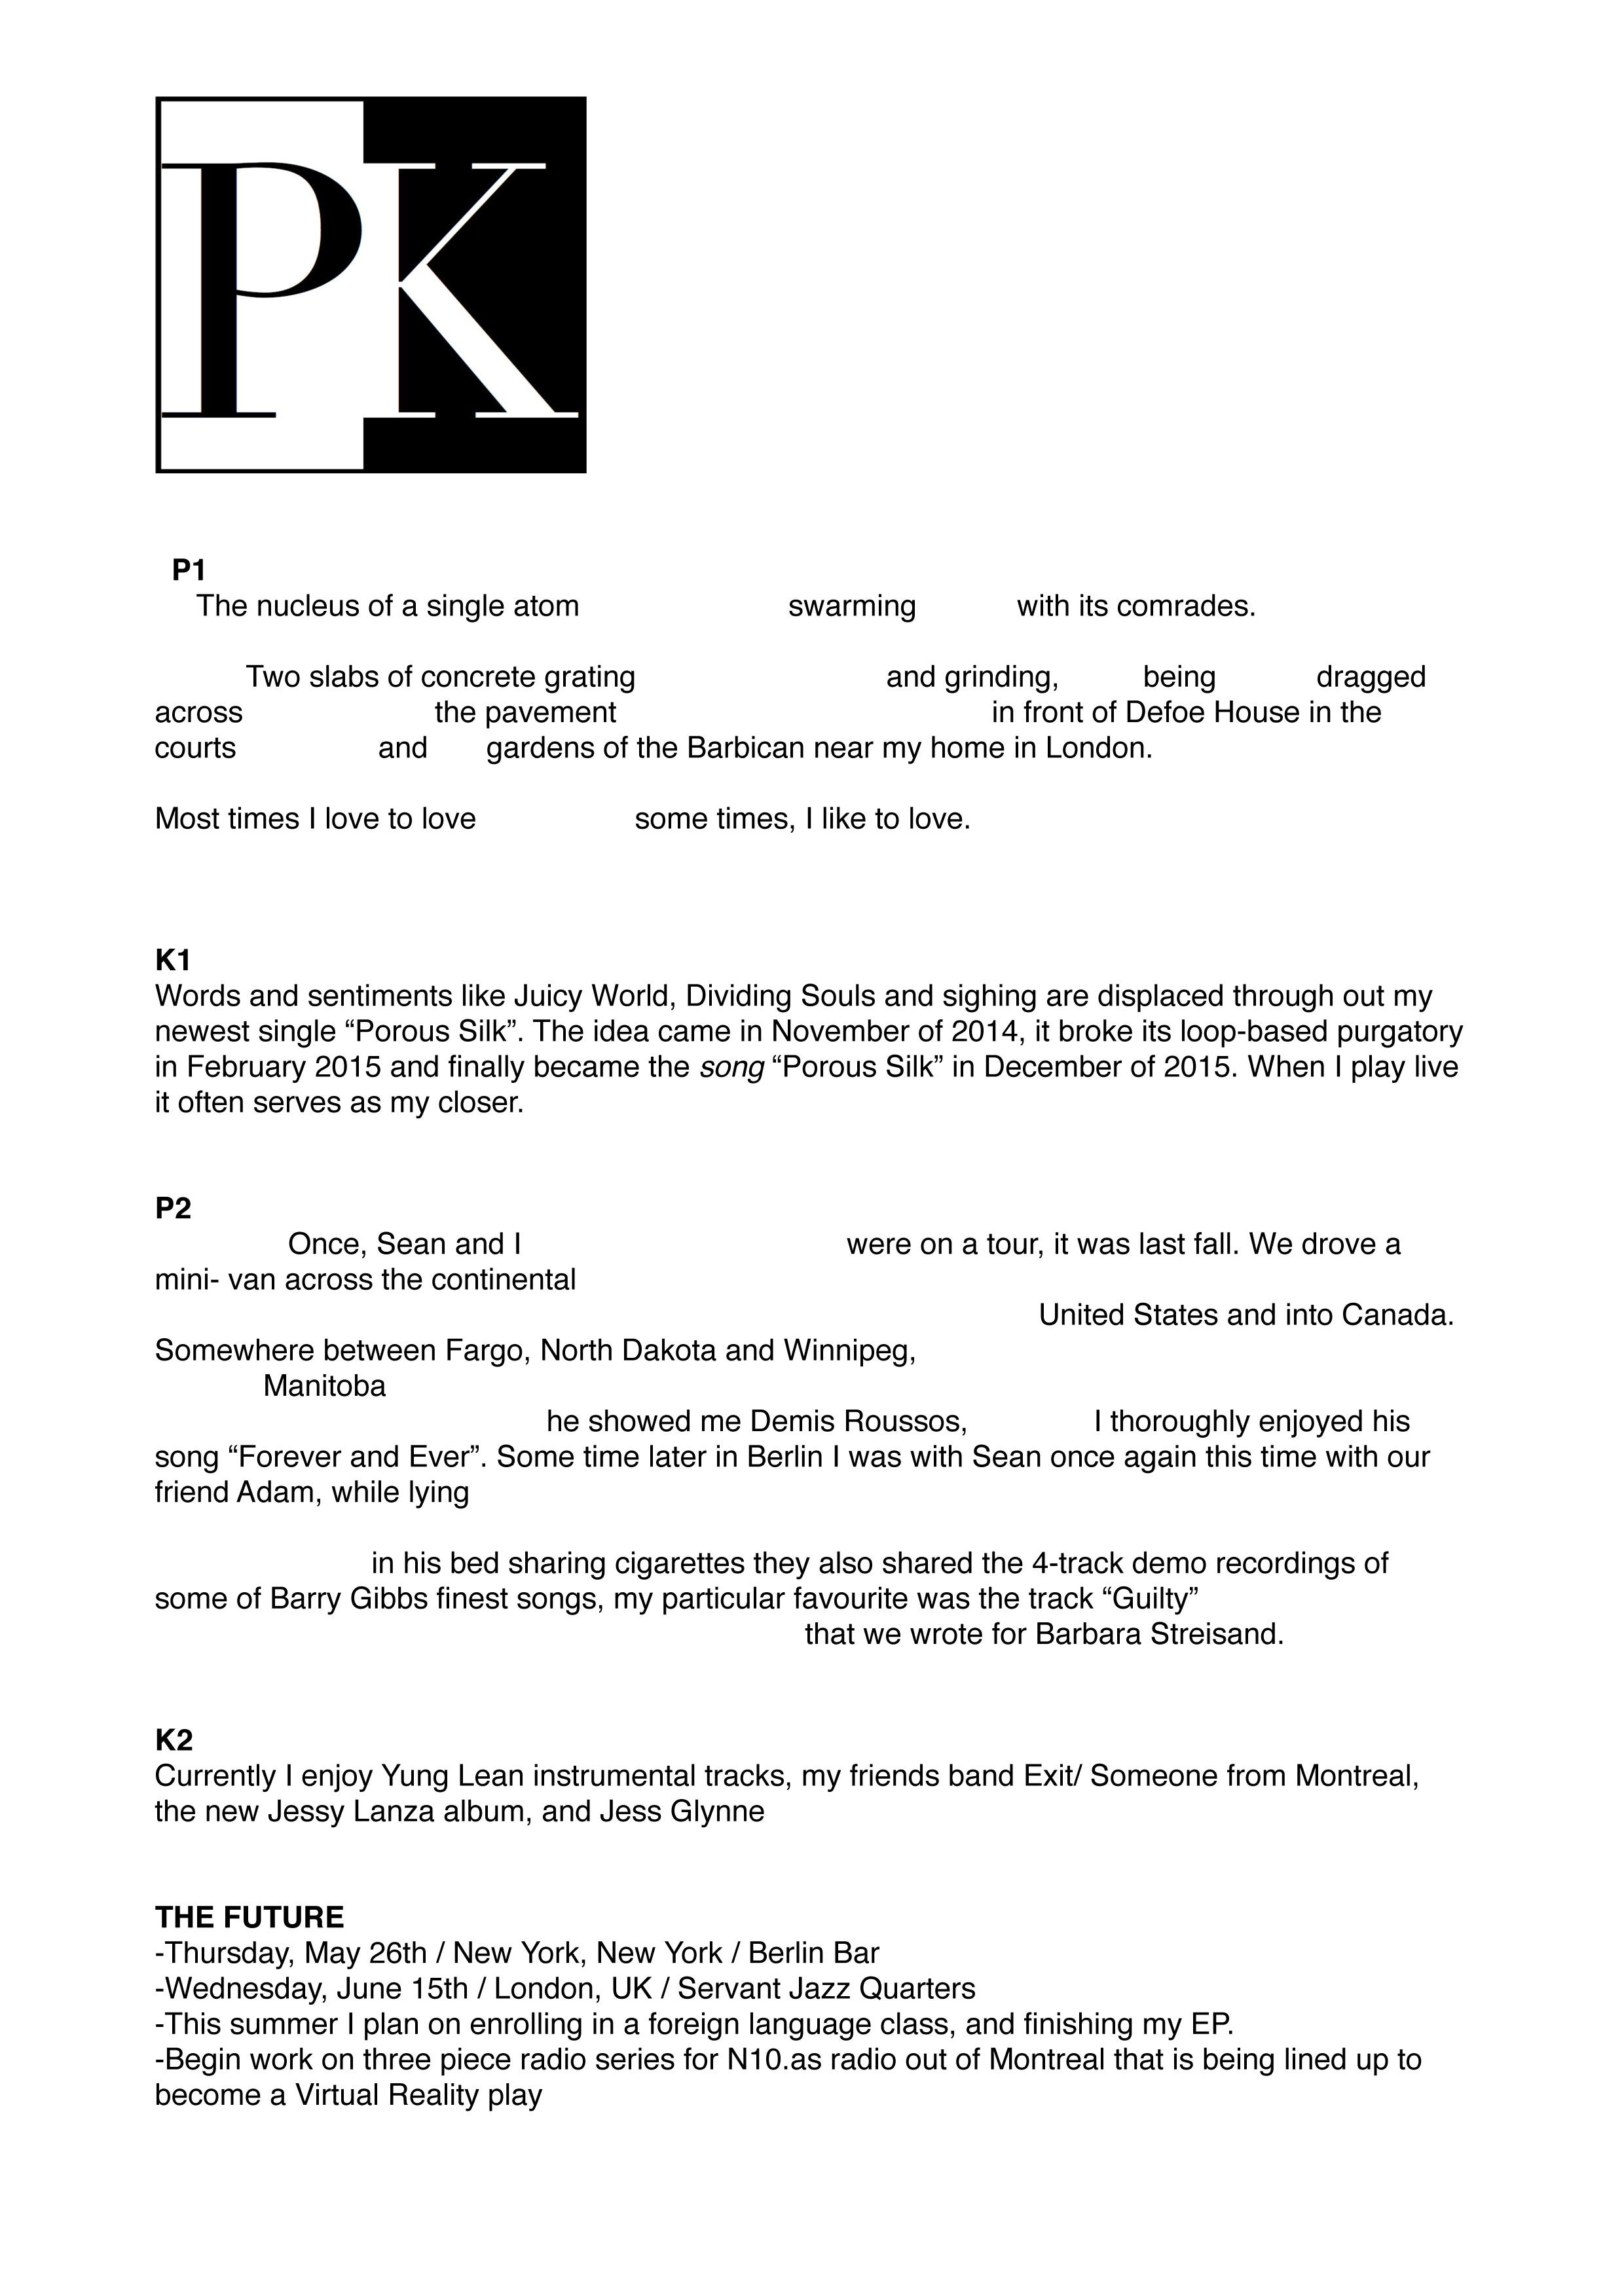 PK-PP-interview-1